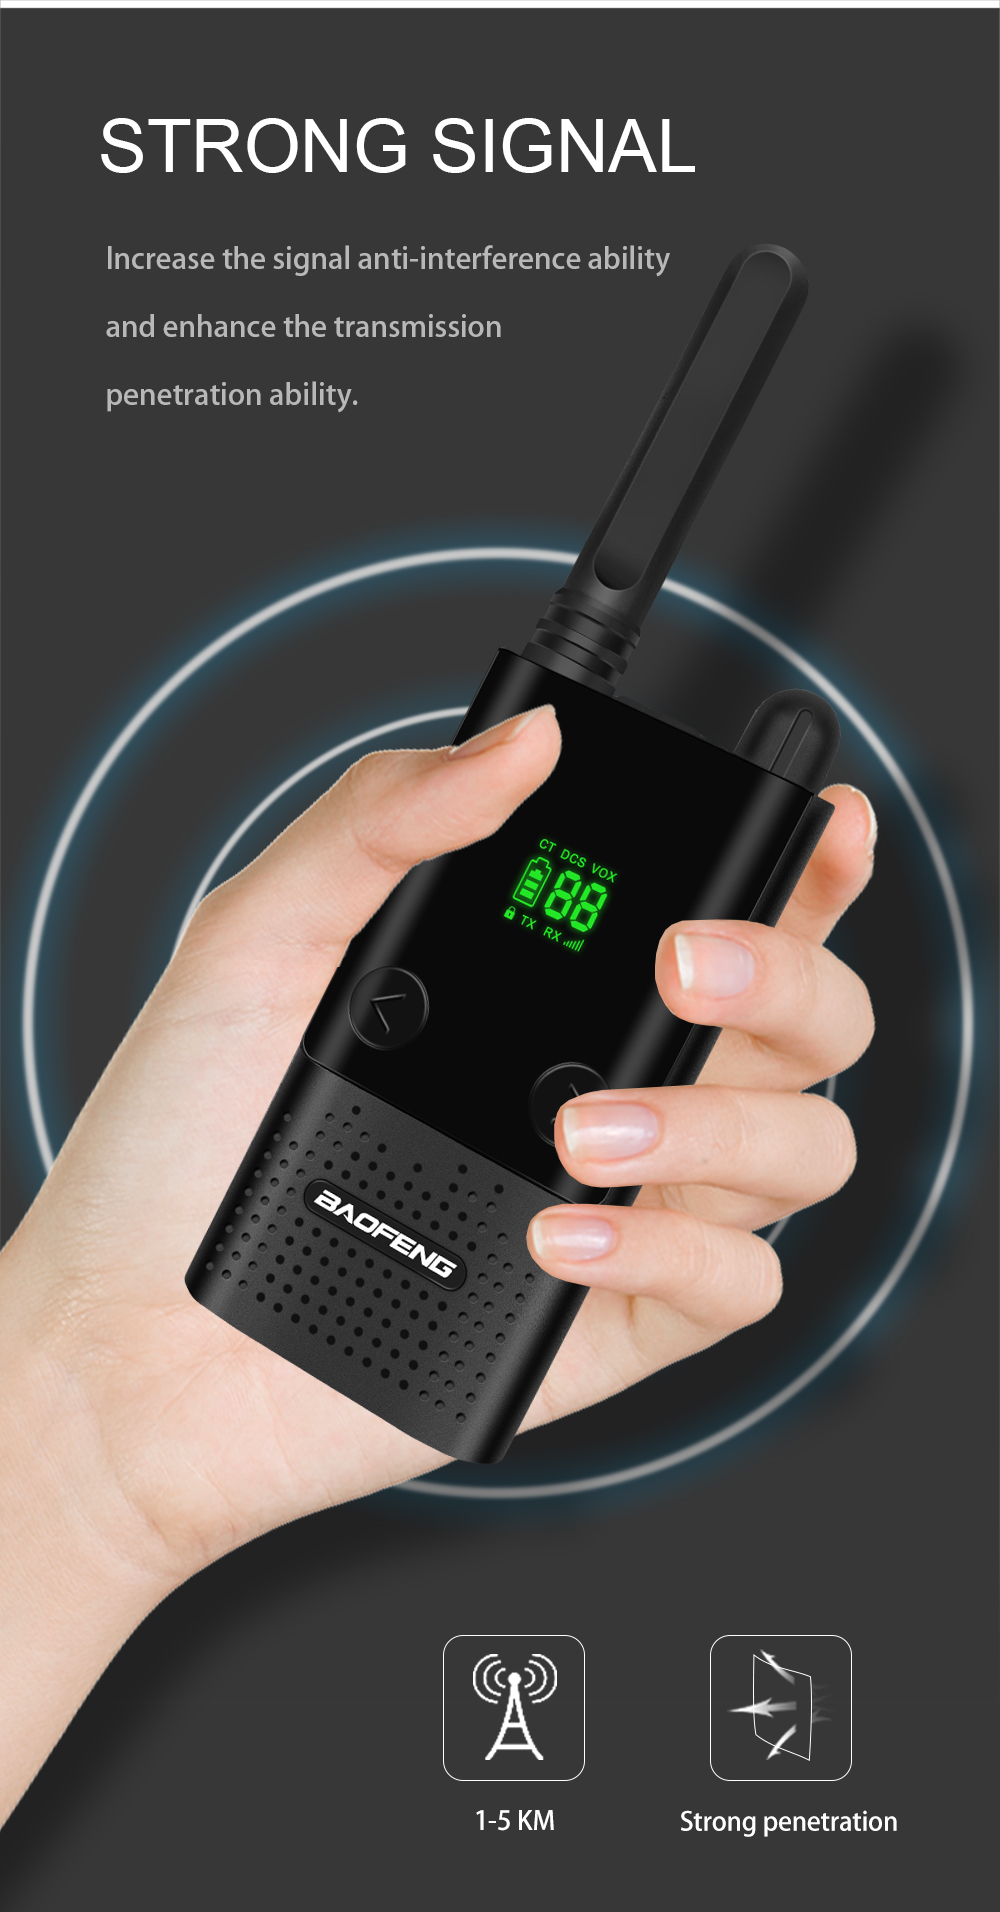 Slim Ασύρματος Φορητός Πομποδέκτης UHF 5W με VOX & 99 Κανάλια - Baofeng